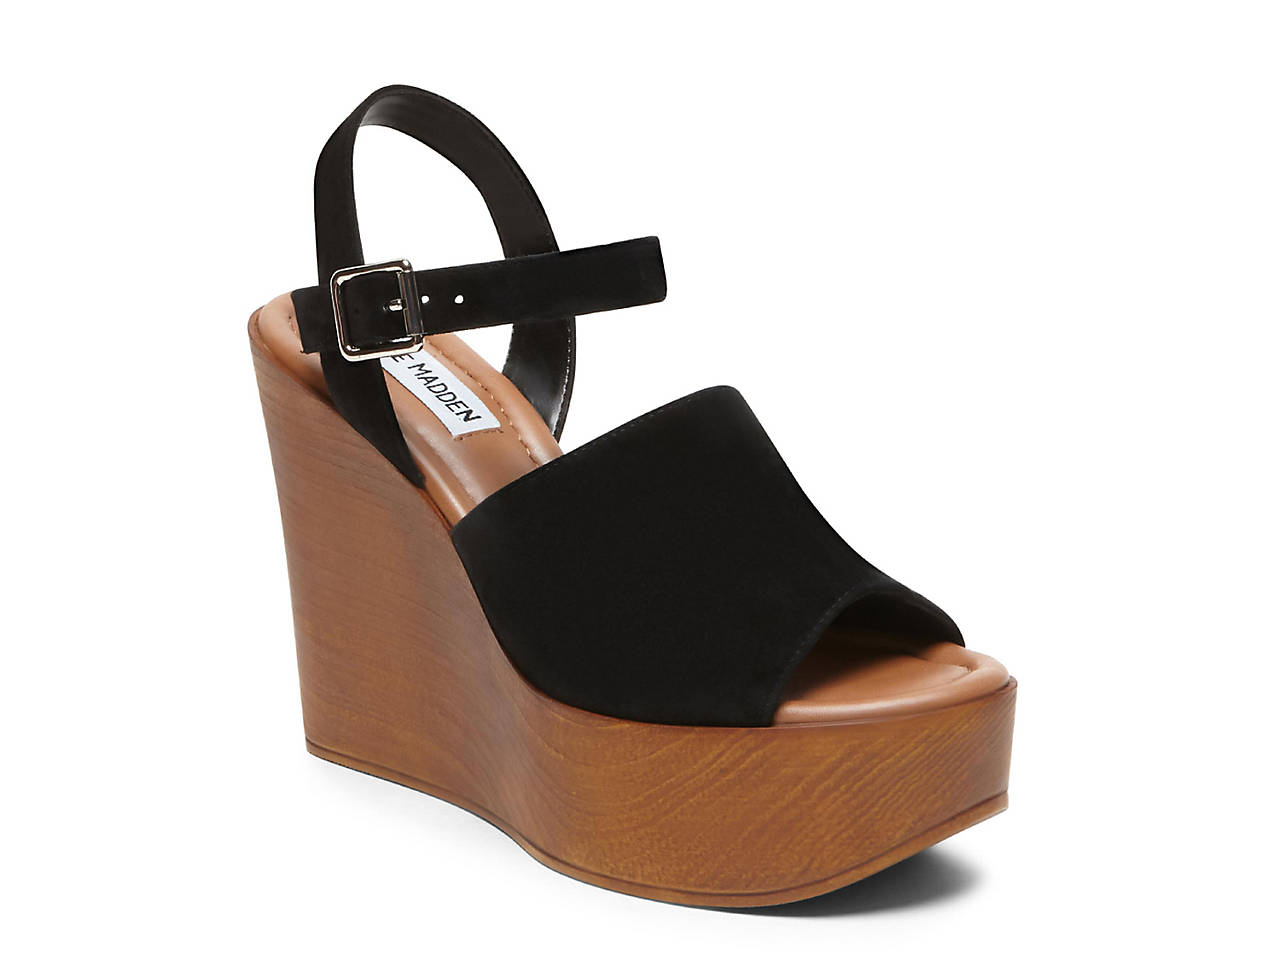 920e23fcb50 Bellini Wedge Sandal